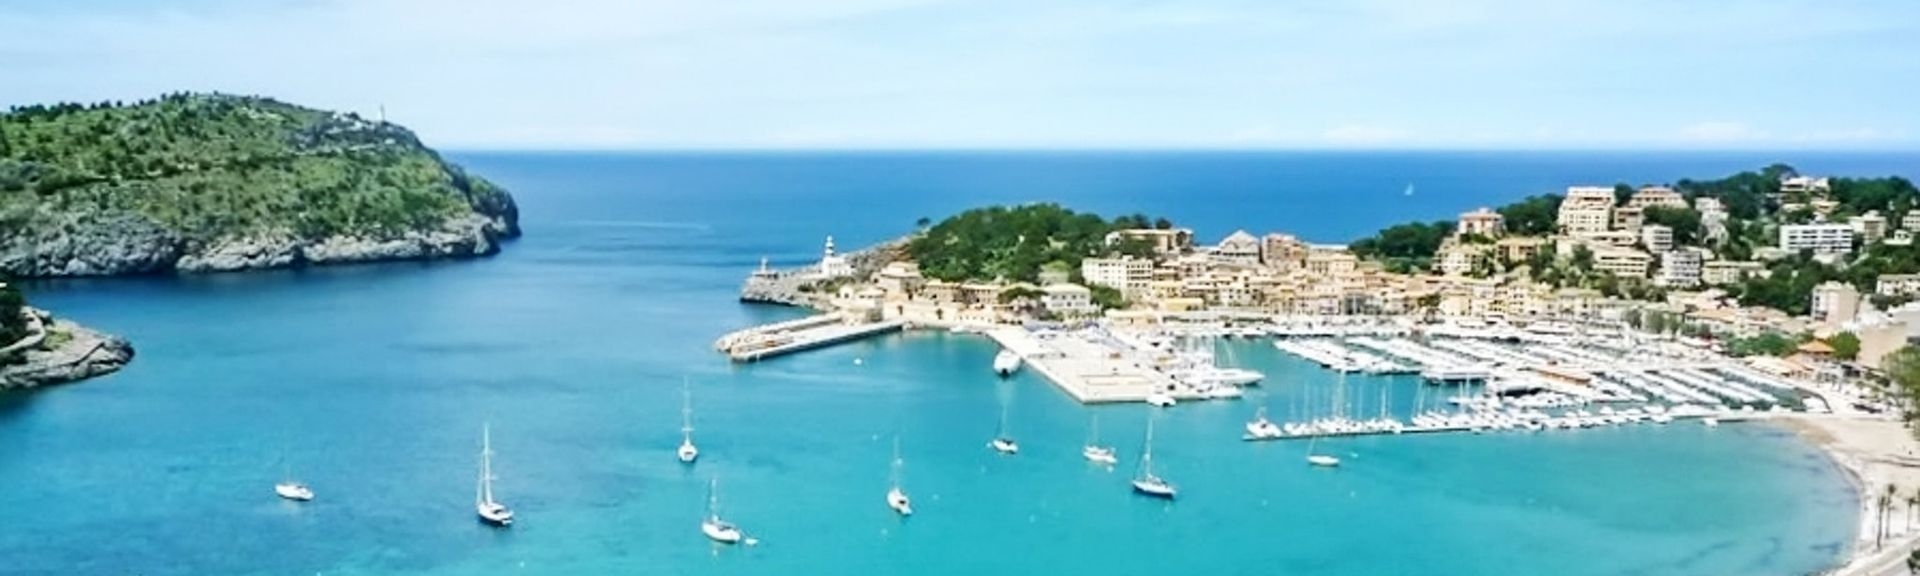 Andratx, Balearic Islands, Spain